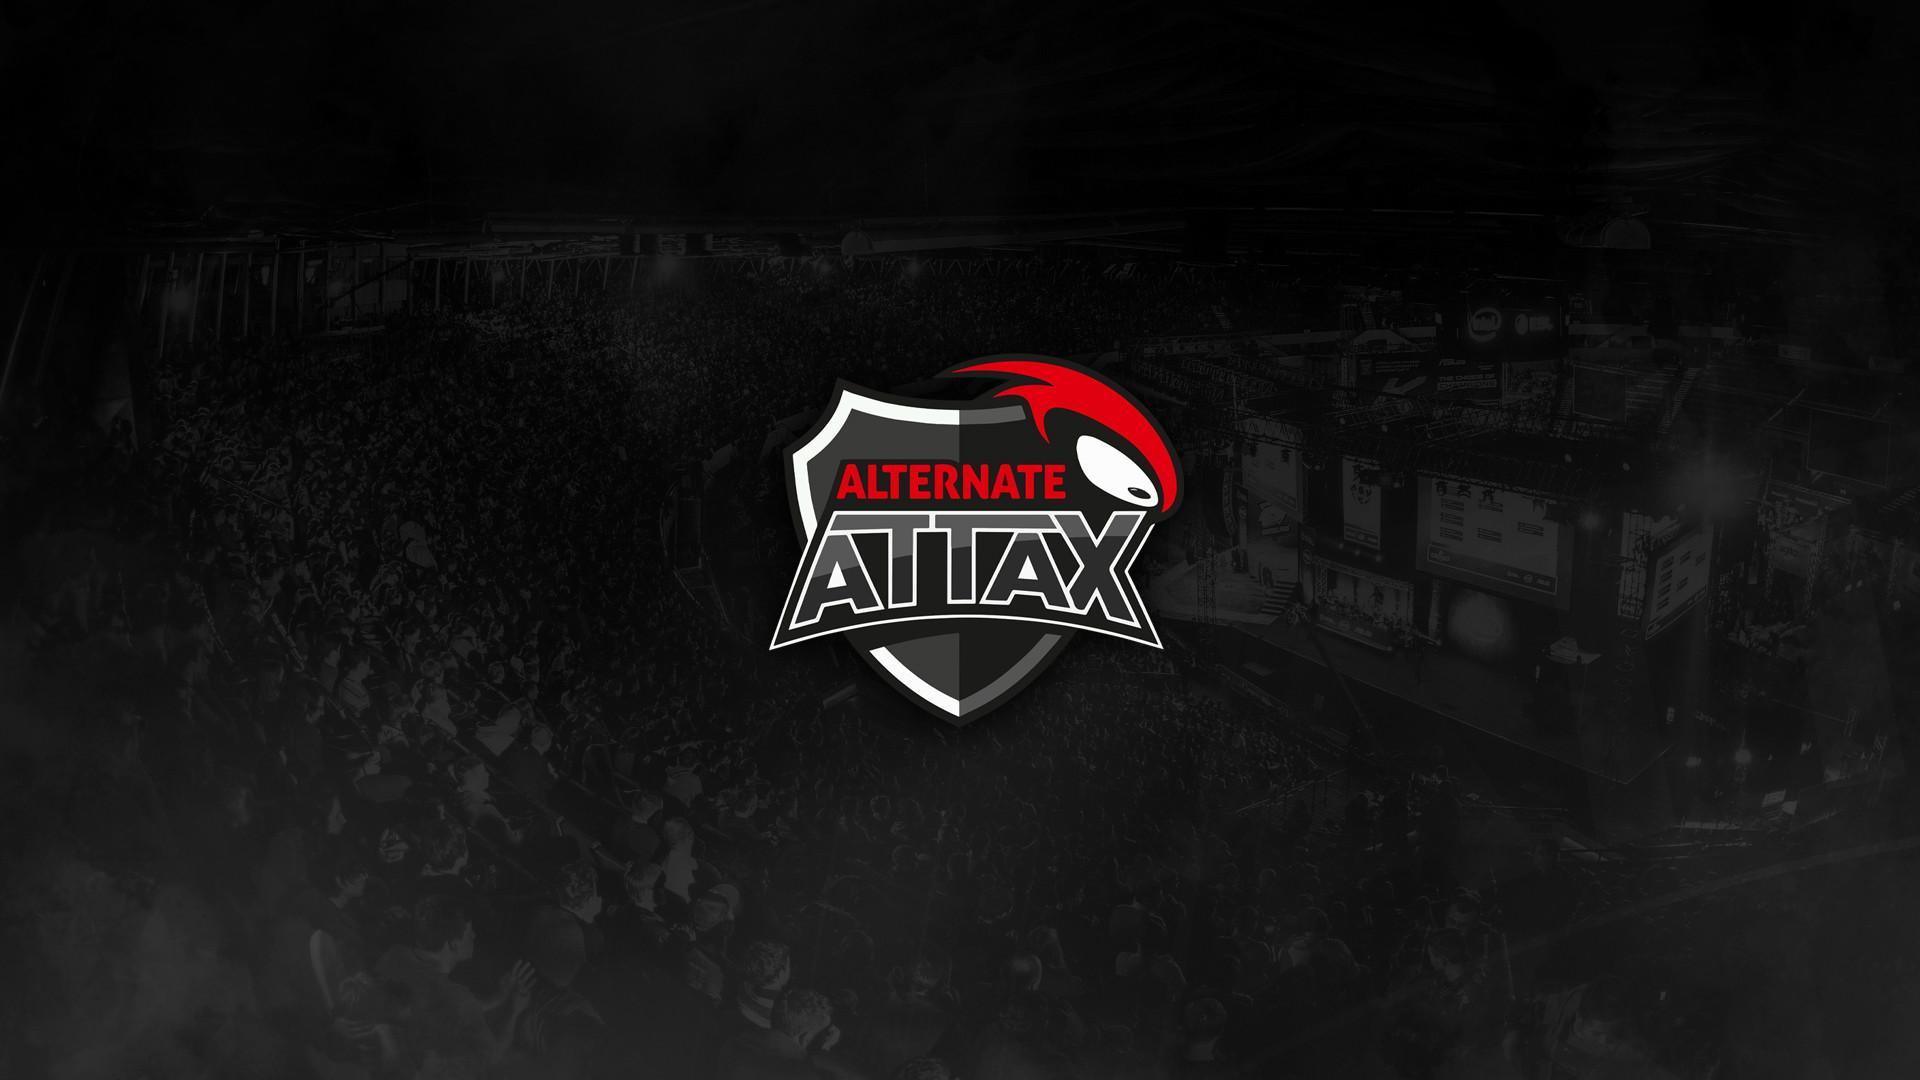 ALTERNATE aTTaX stellt gesamtes CS:GO-Team frei